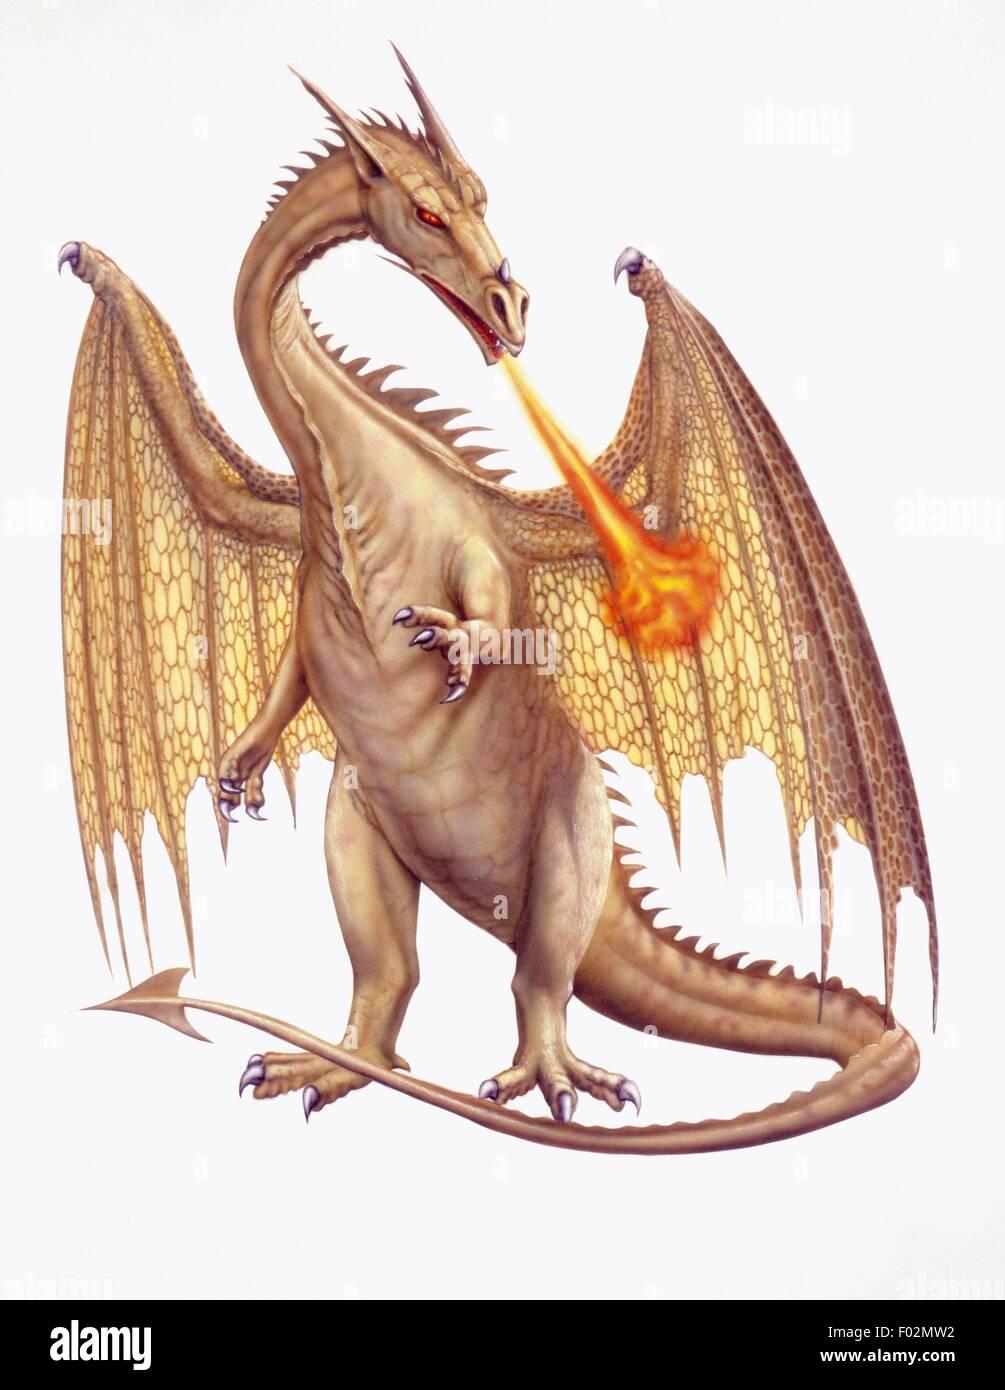 Dragon, fantastic animal. Illustration. - Stock Image